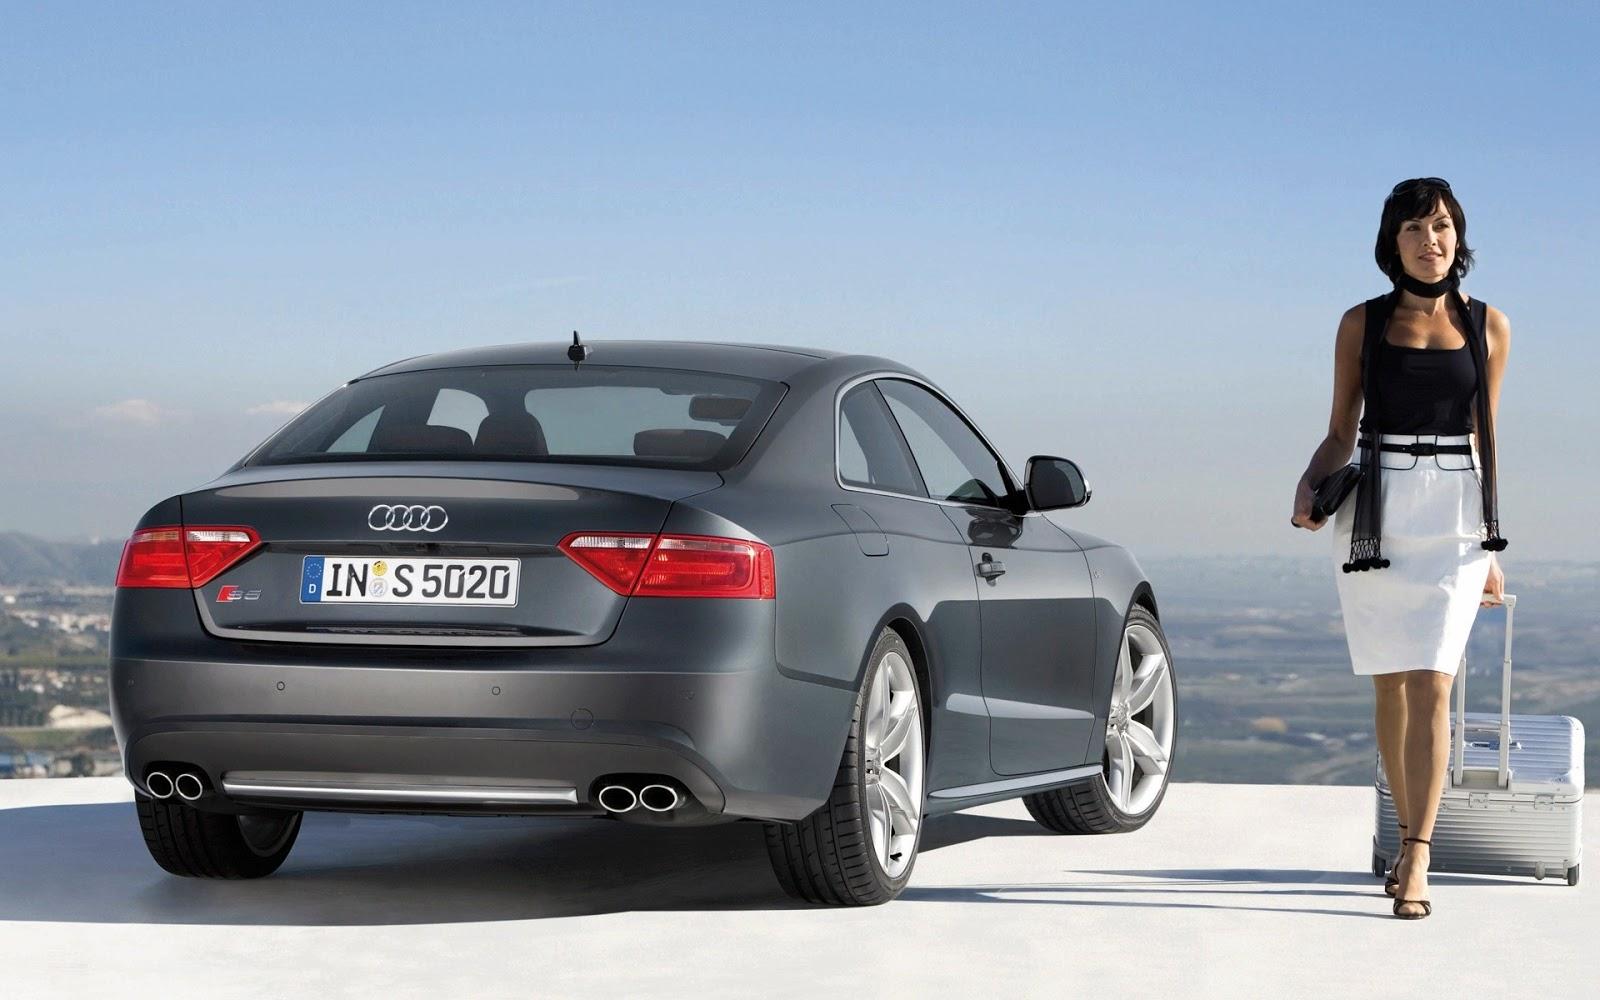 Audi Luxury Car Showroom In Chandigarh City The World Of Audi Showroom